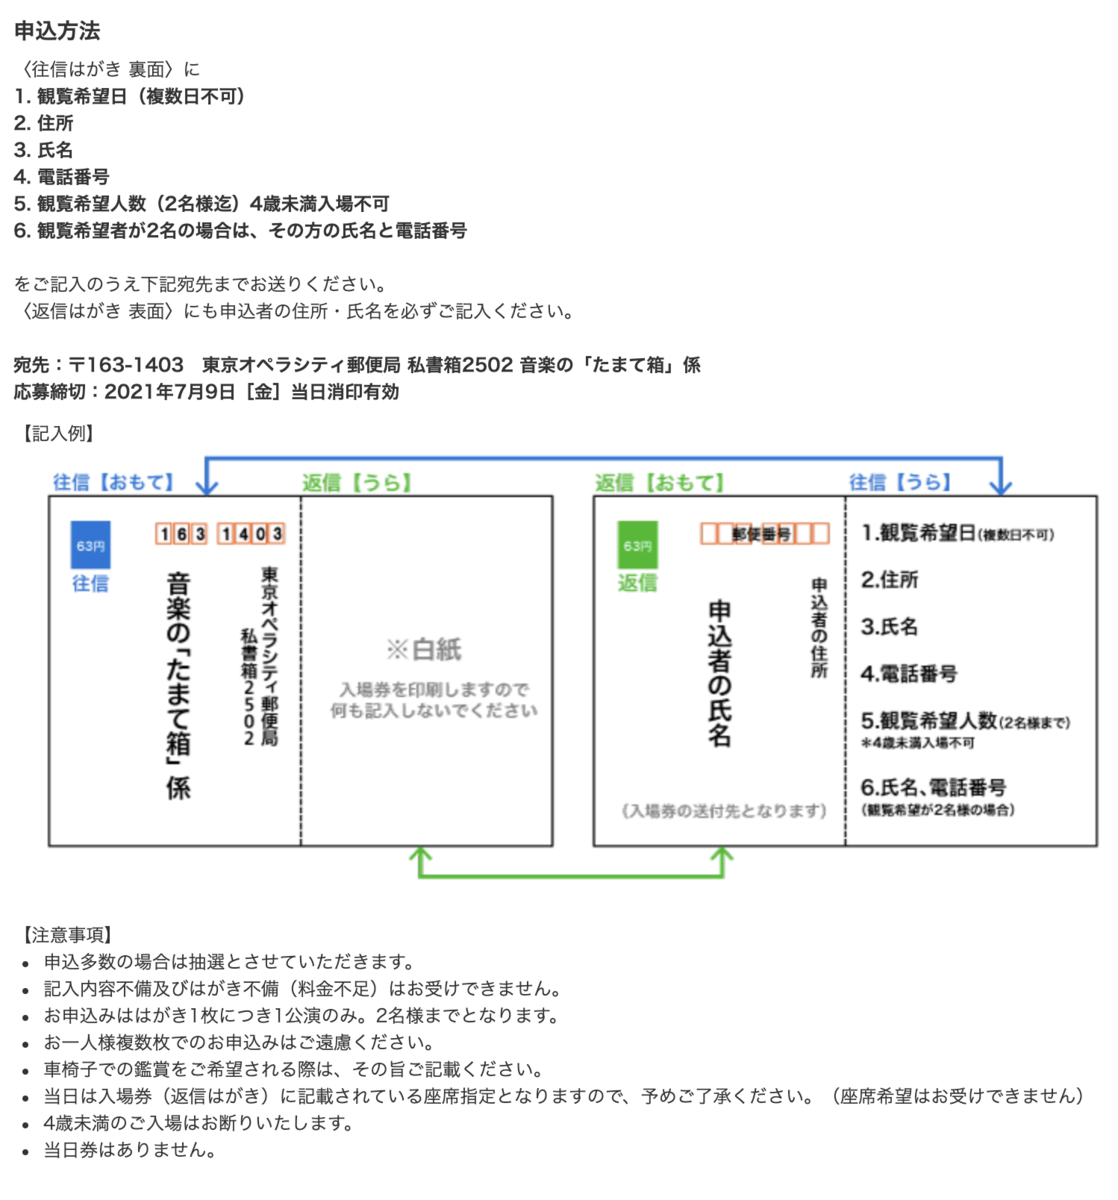 f:id:RetCapt1501:20210627190157p:plain